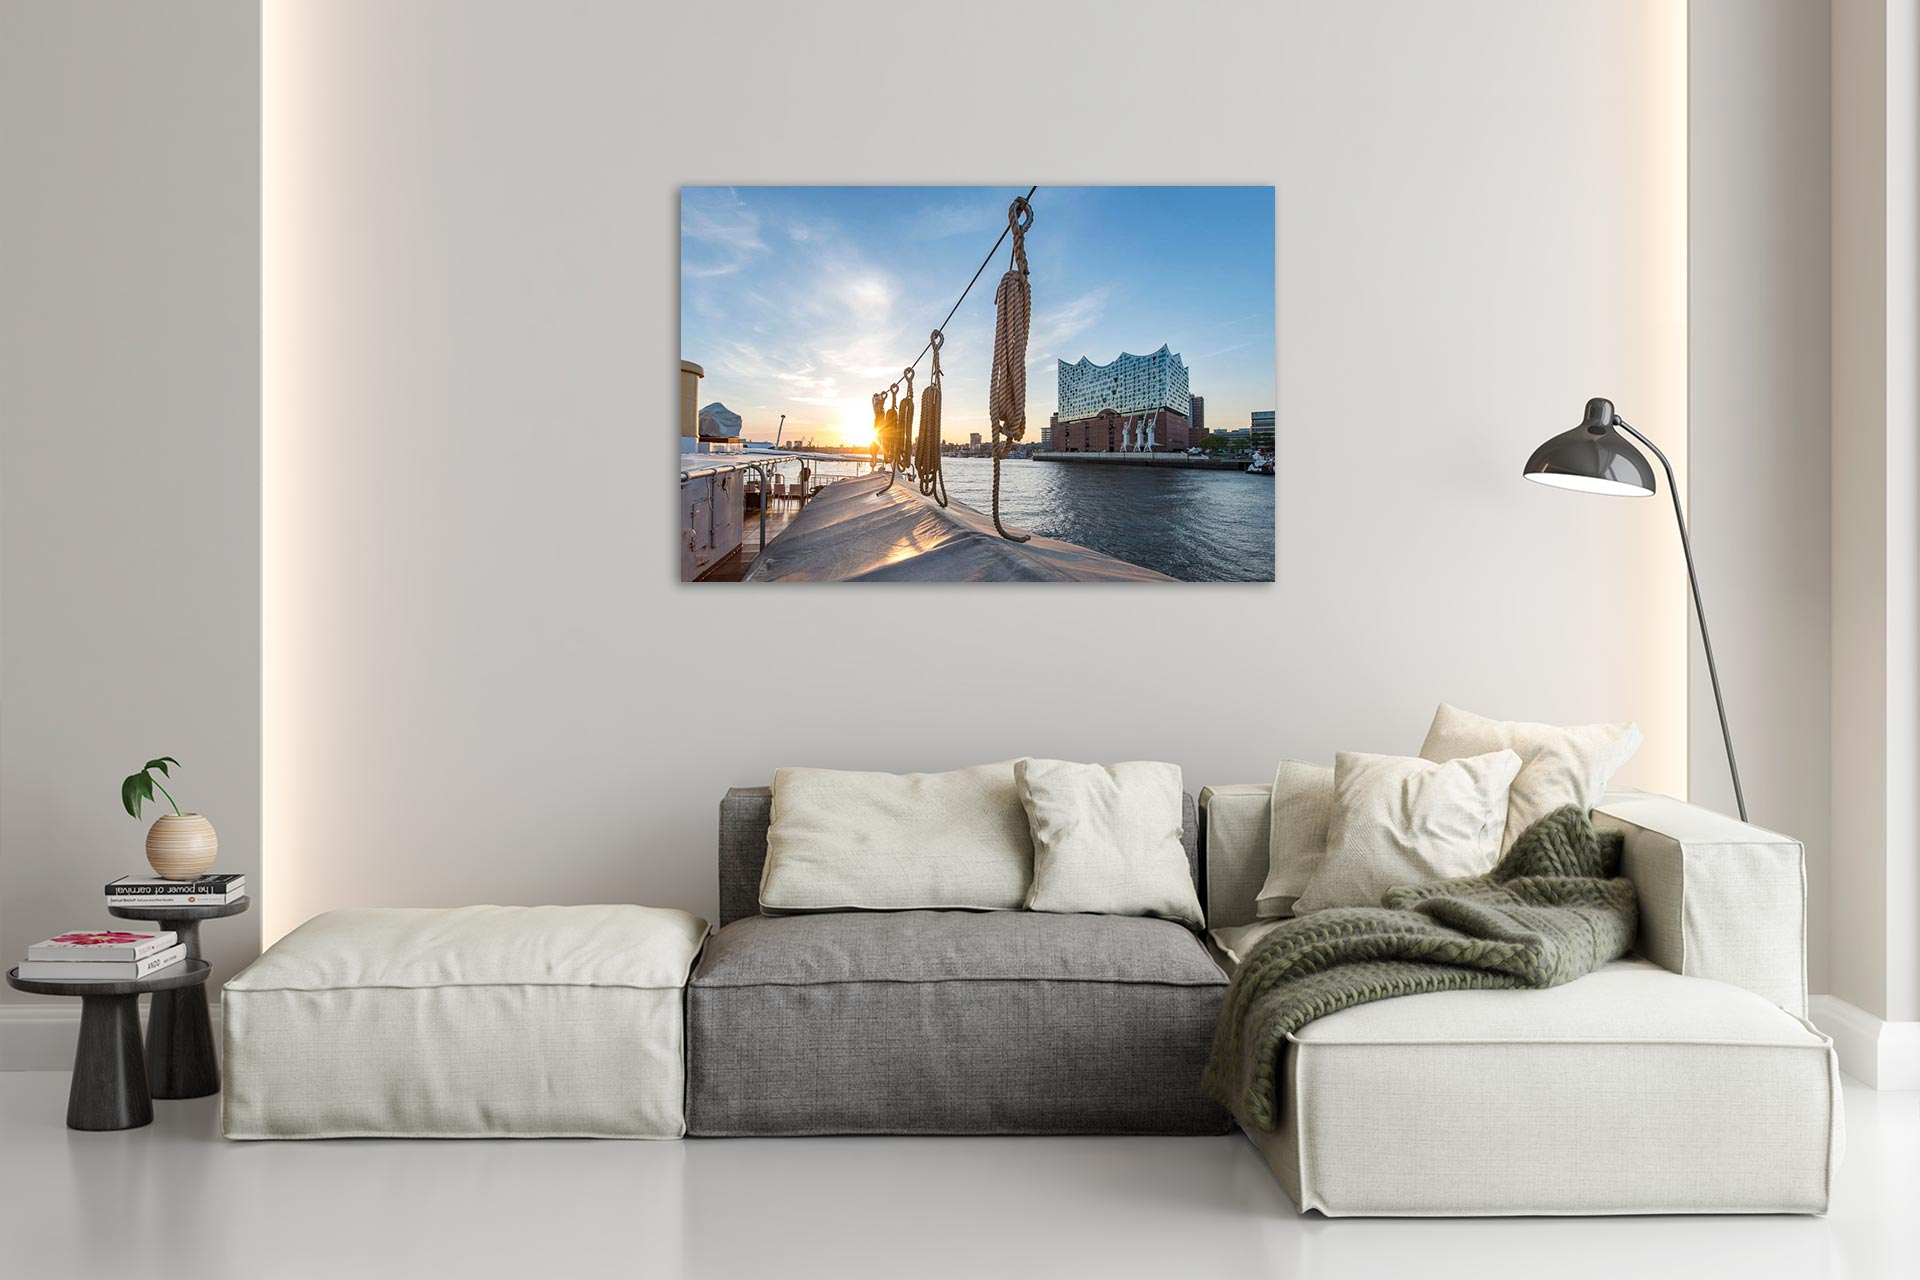 NL073-elbphilharmonie-maritim-hamburg-wandbild-auf-leinwand-acrylglas-aludibond-wohnzimmer